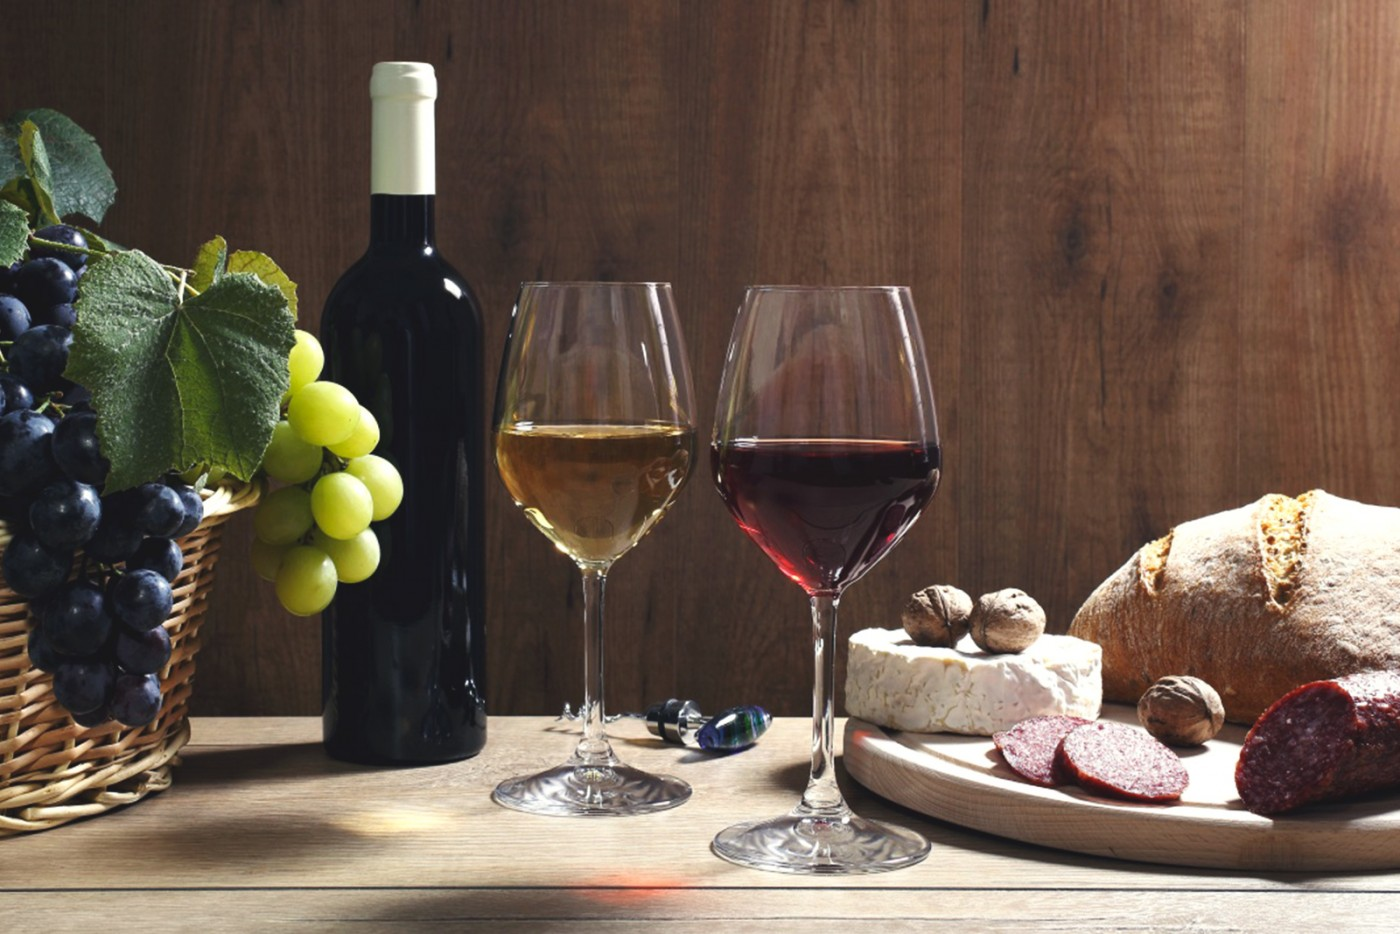 Quels vins choisir pour accompagner vos fromages ?